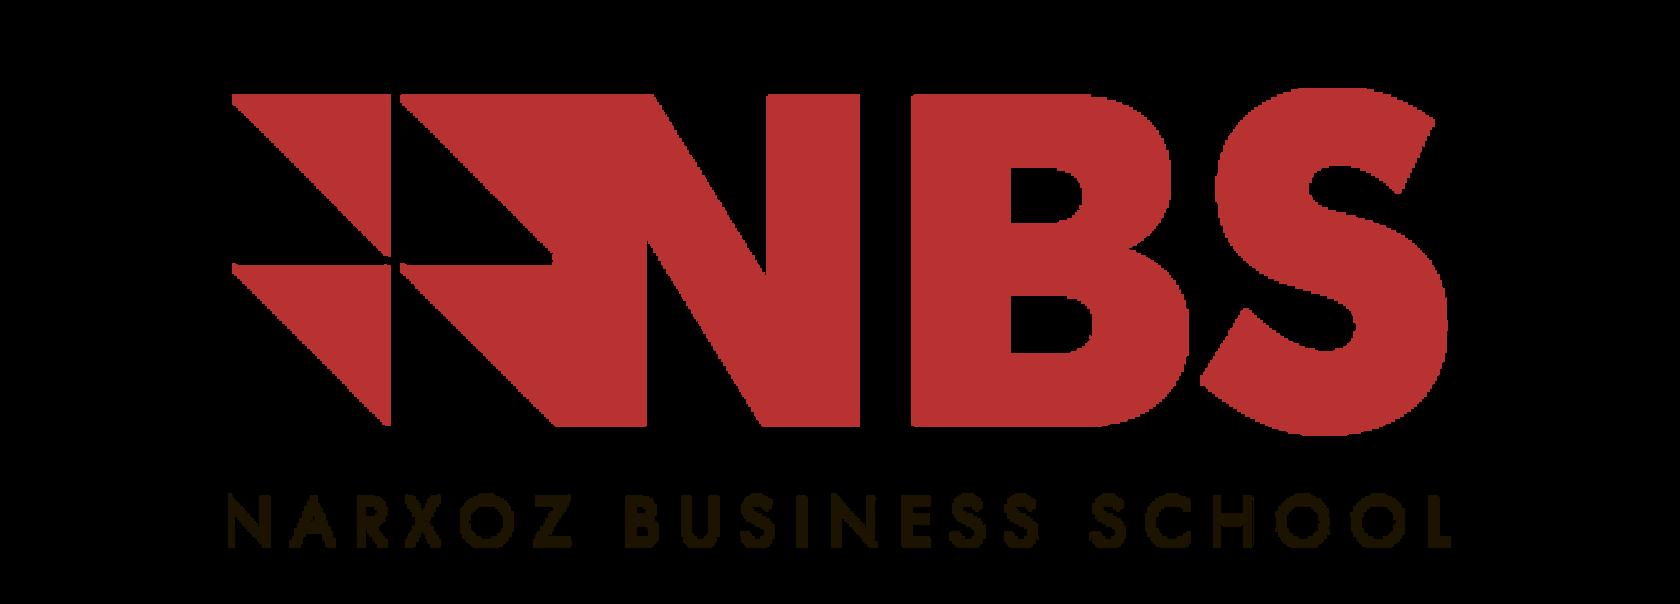 Narxoz Business School